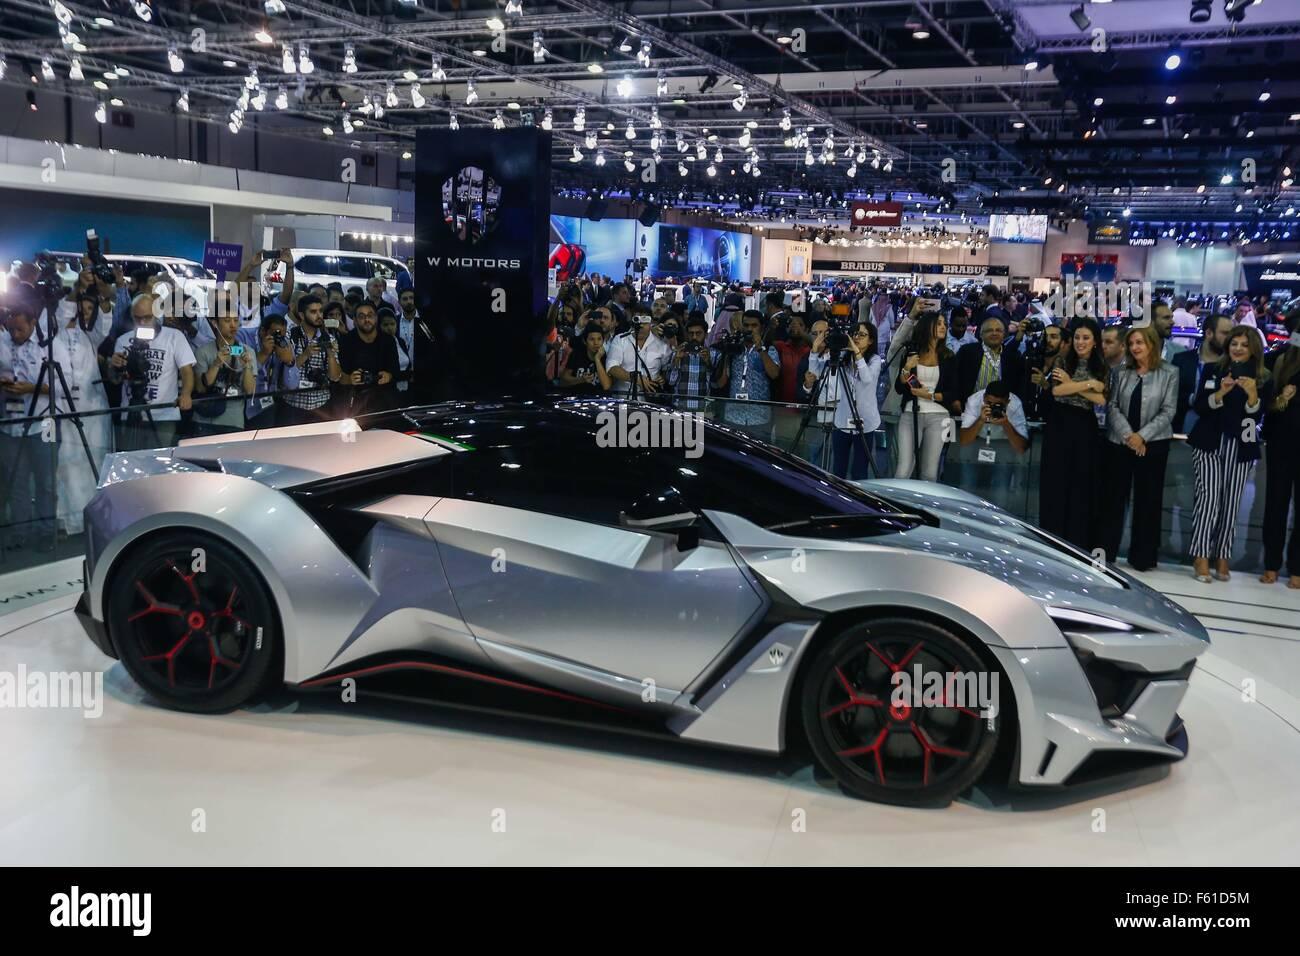 Dubai United Arab Emirates 10th Nov 2015 A Sports Car